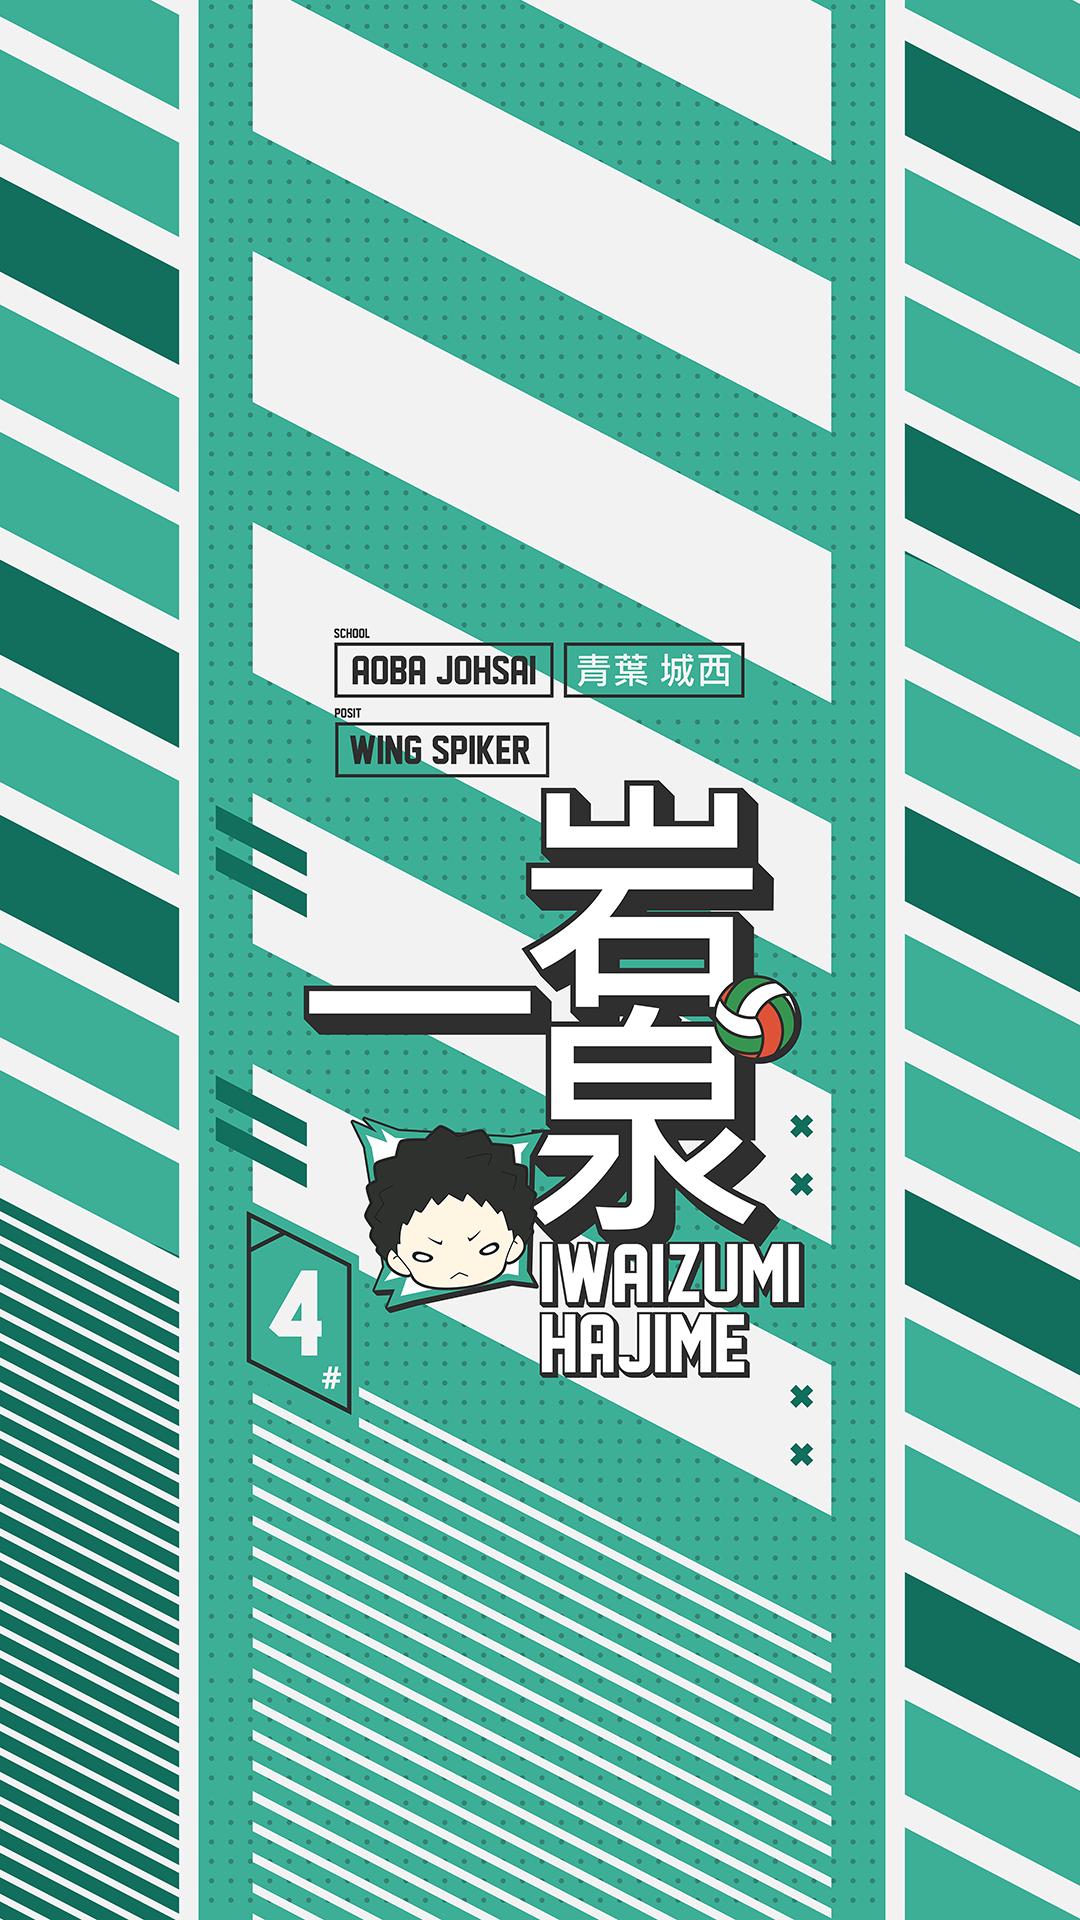 Iwaizumi Hajime Aoba Johsai Haikyuu Wallpaper In 2020 Haikyuu Wallpaper Iwaizumi Cute Anime Wallpaper